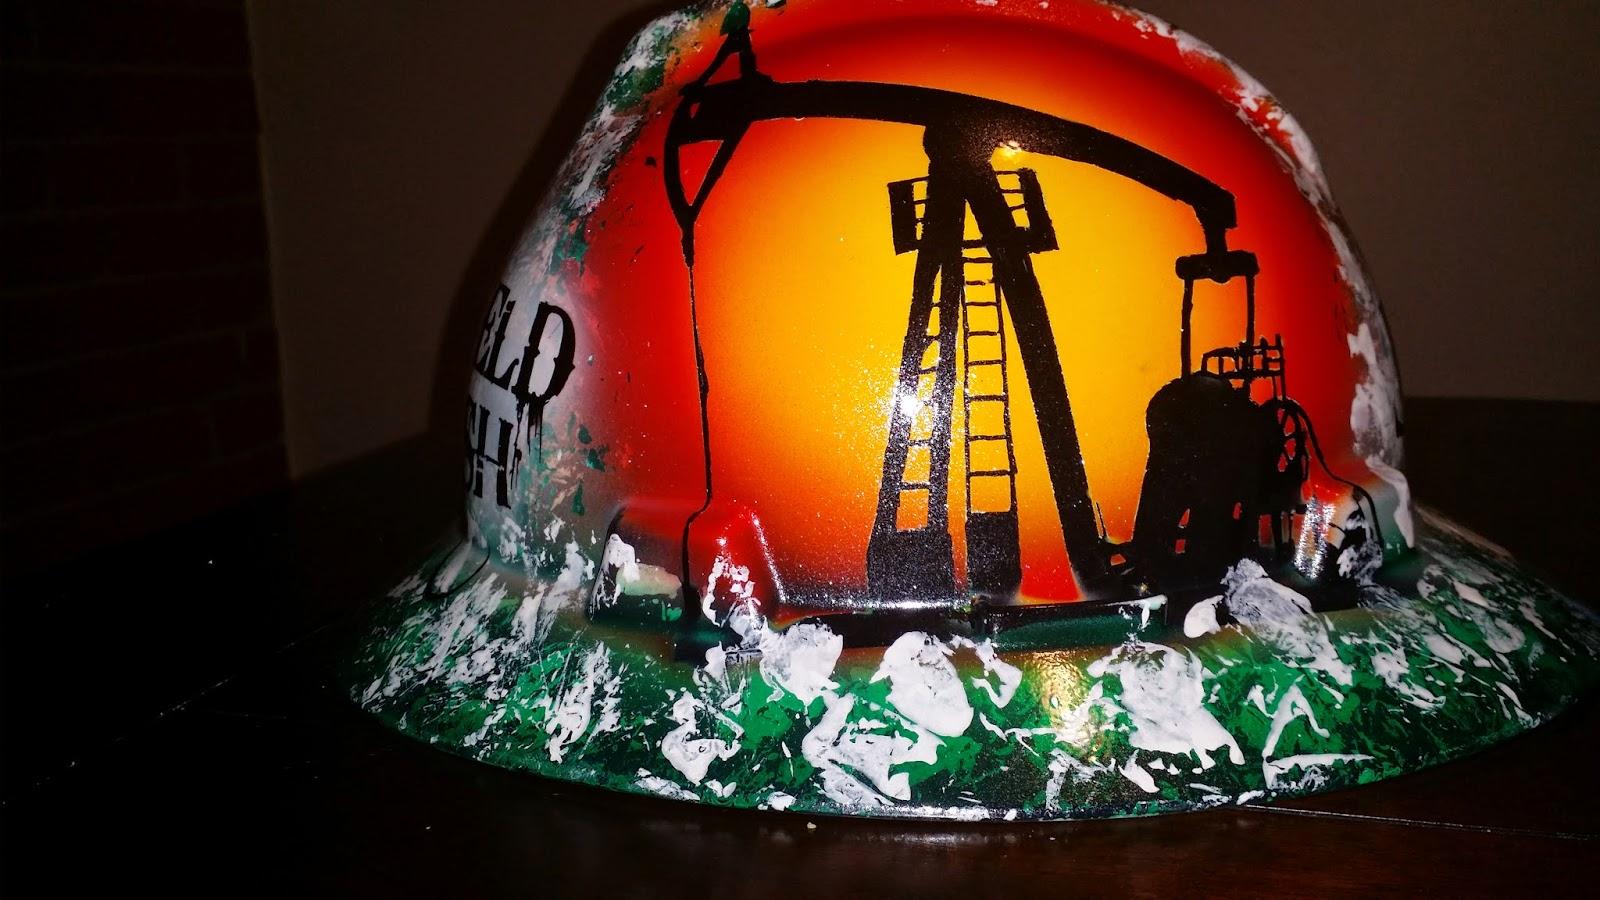 Green oilfield trash custom hard hat